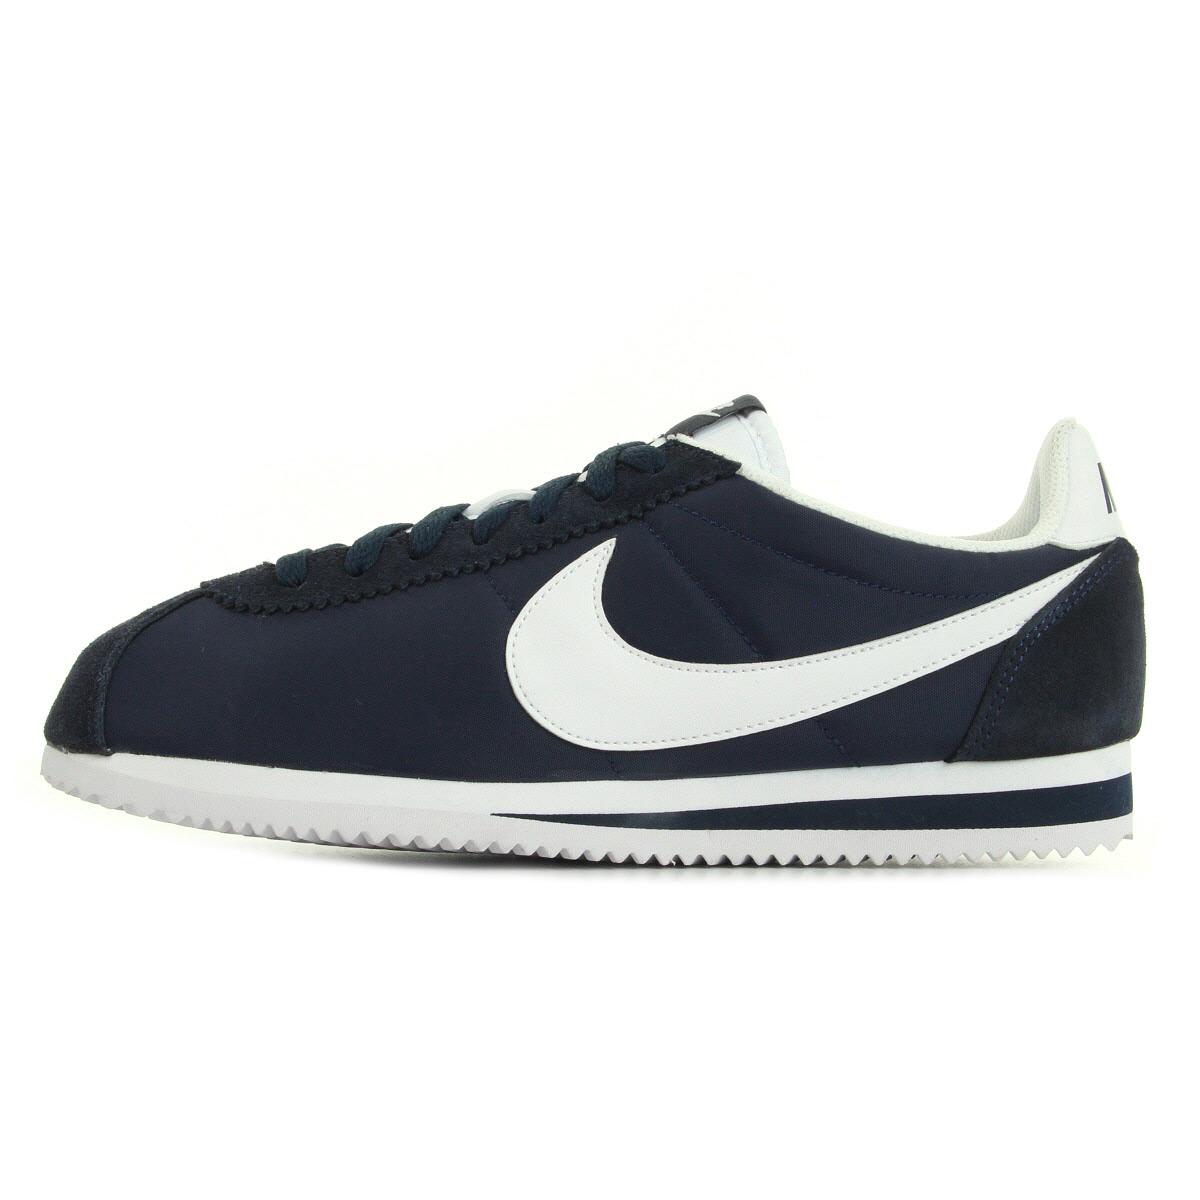 Nike Classic Cortez Nylon 807472410, Baskets mode